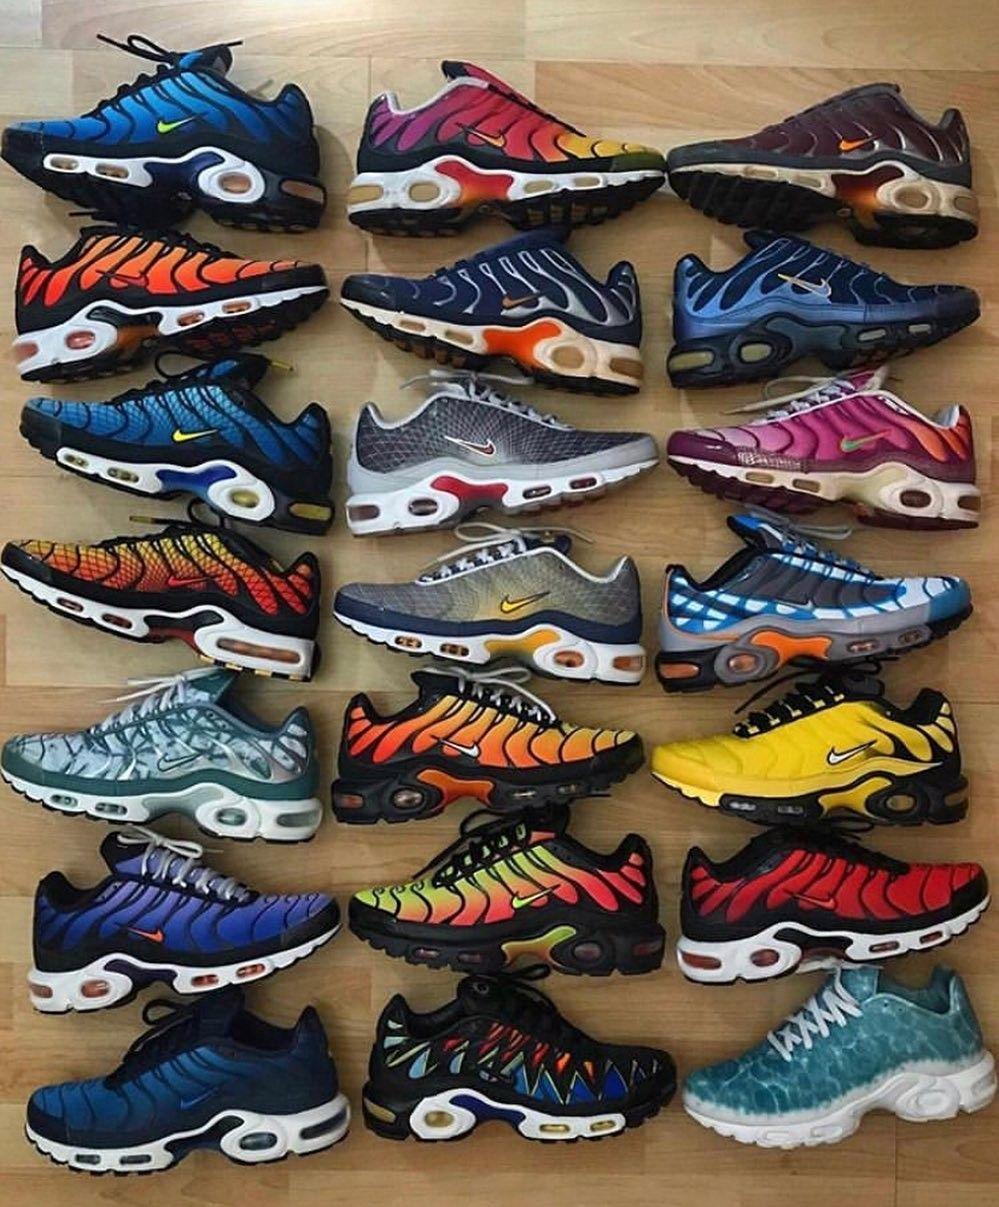 LOVE ❤#NIKE TN ????#SNEAKERS | Nike air shoes, Nike air max tn, Nike tn